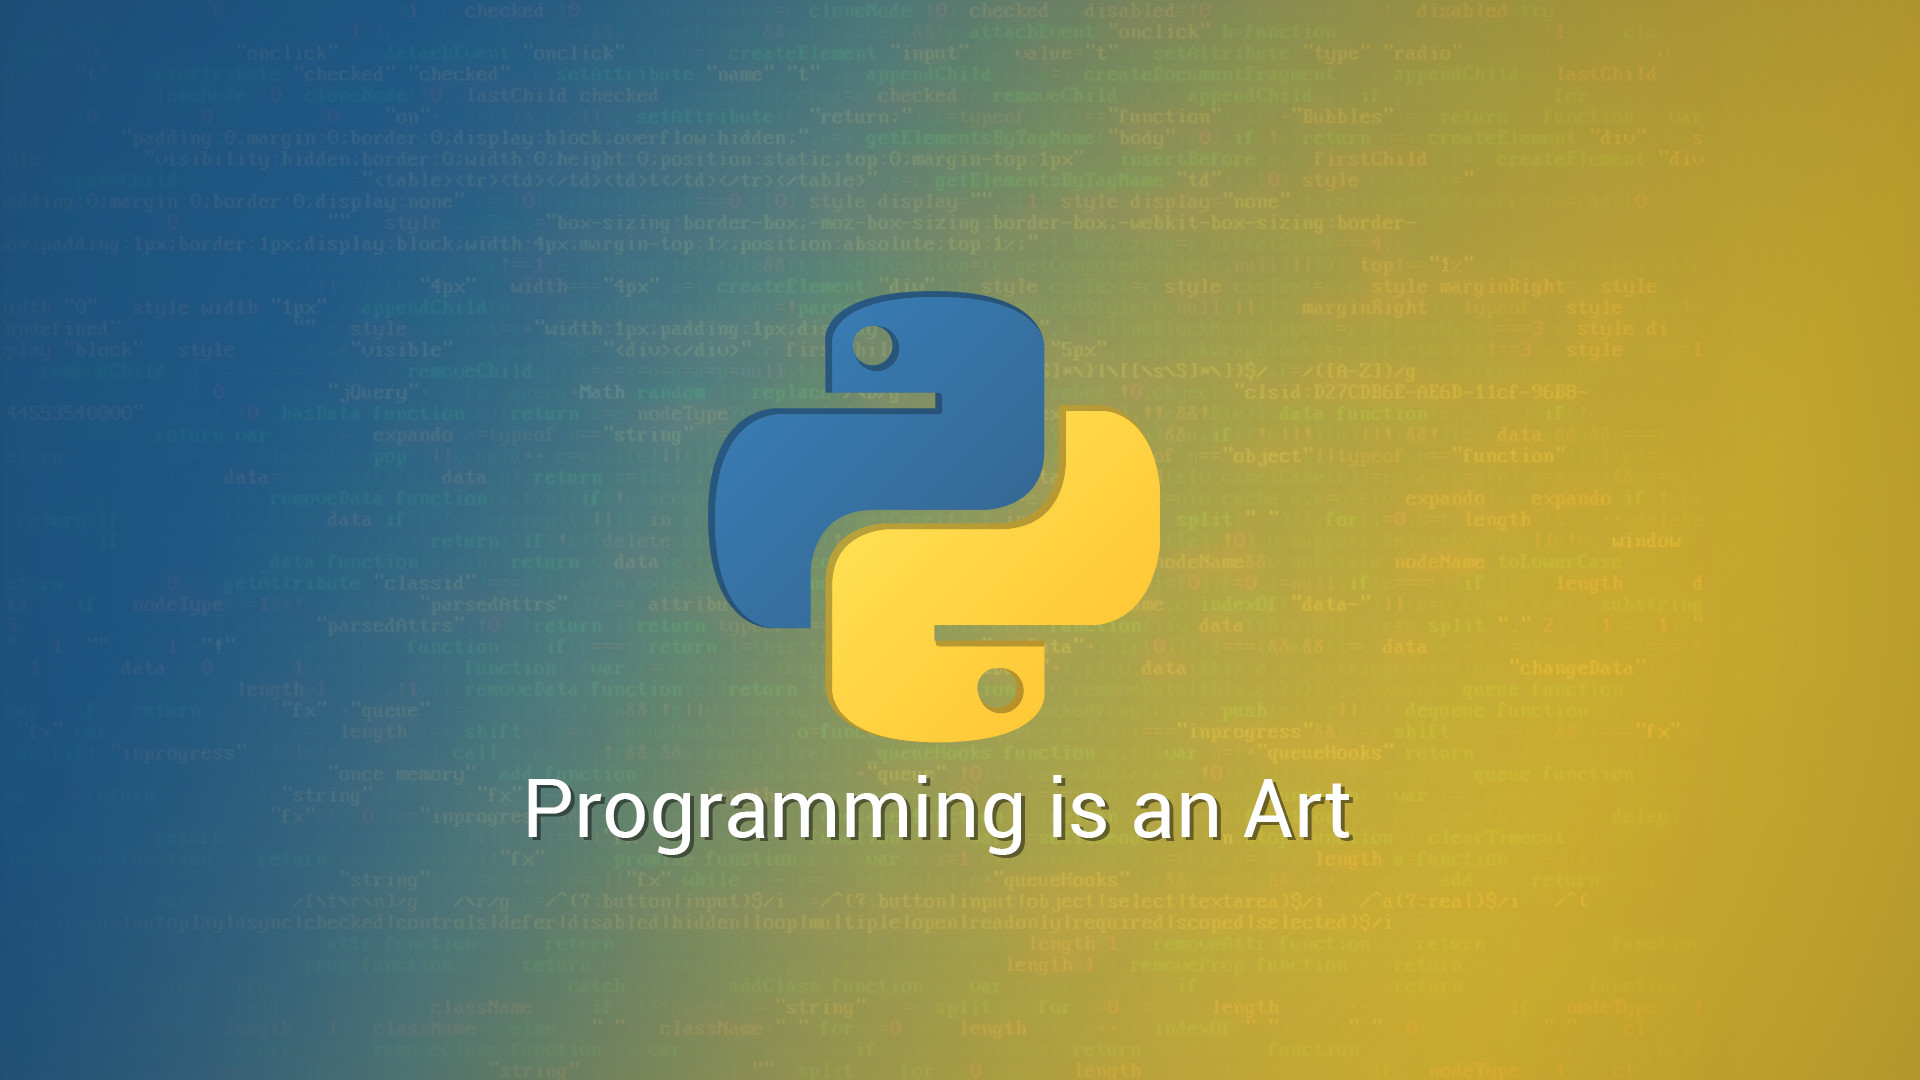 Python Programming Wallpaper (72+ images)